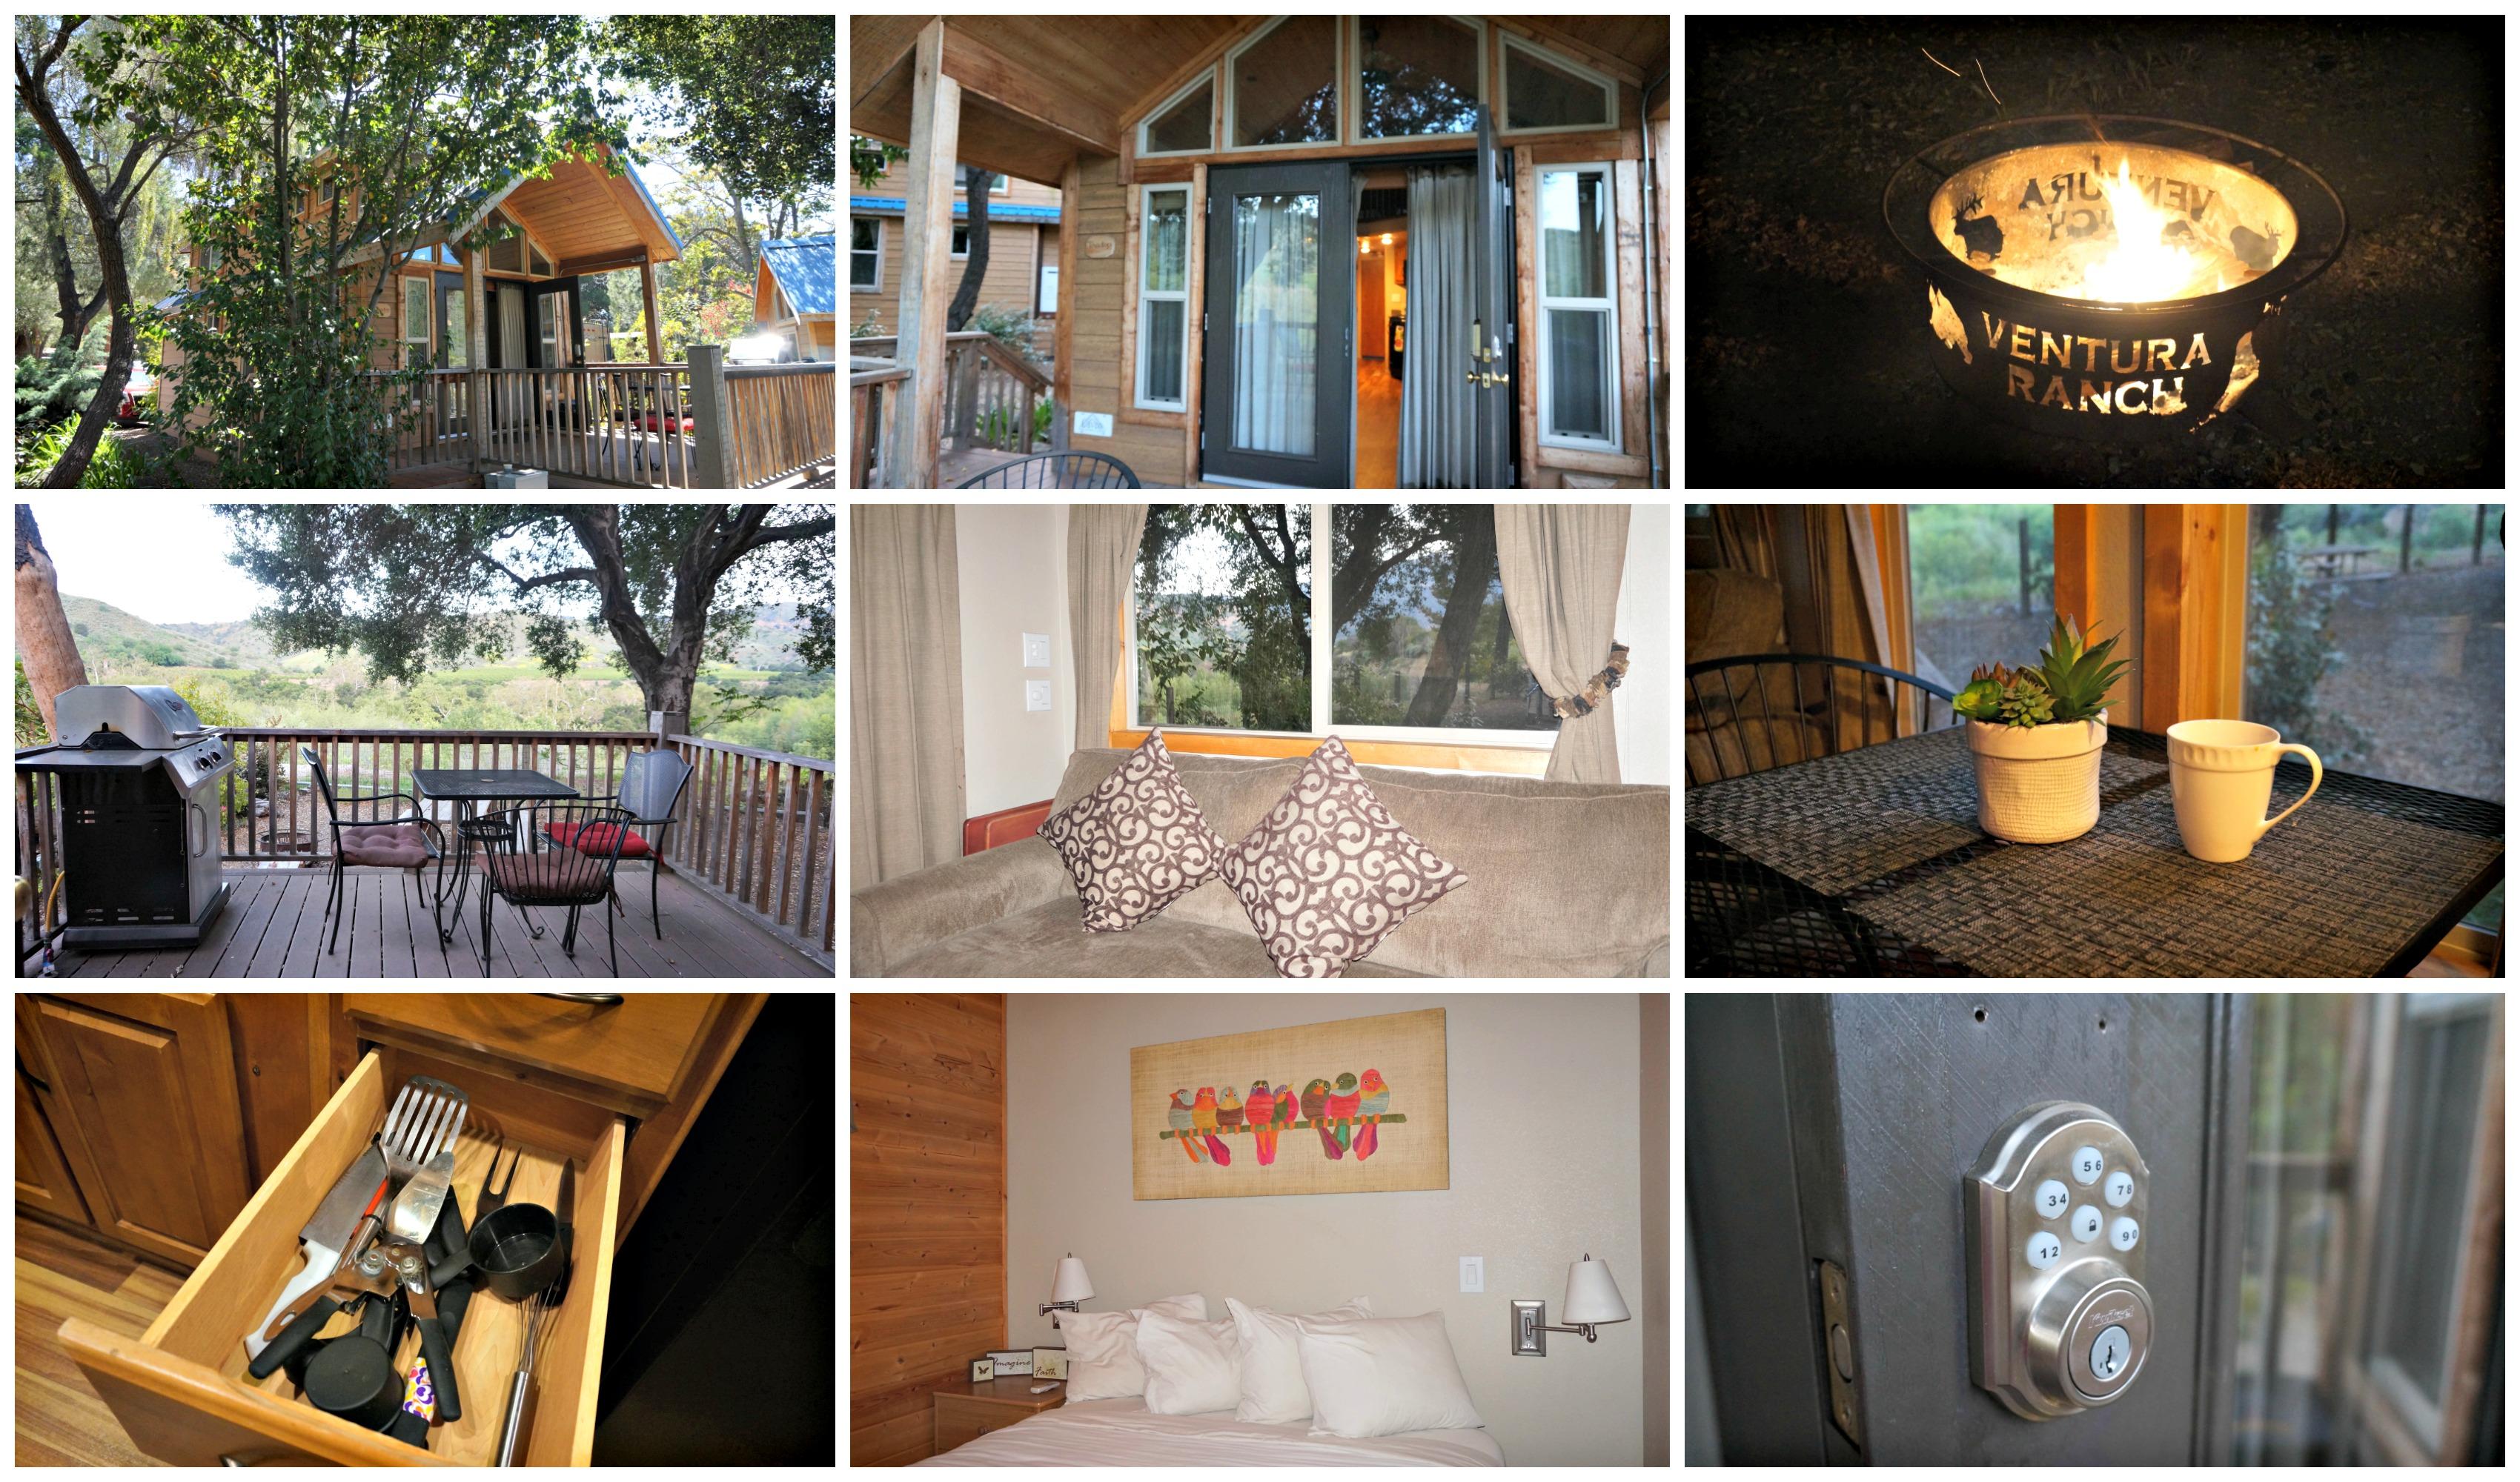 Campamentos familiares mam noticias for La cabana divertida